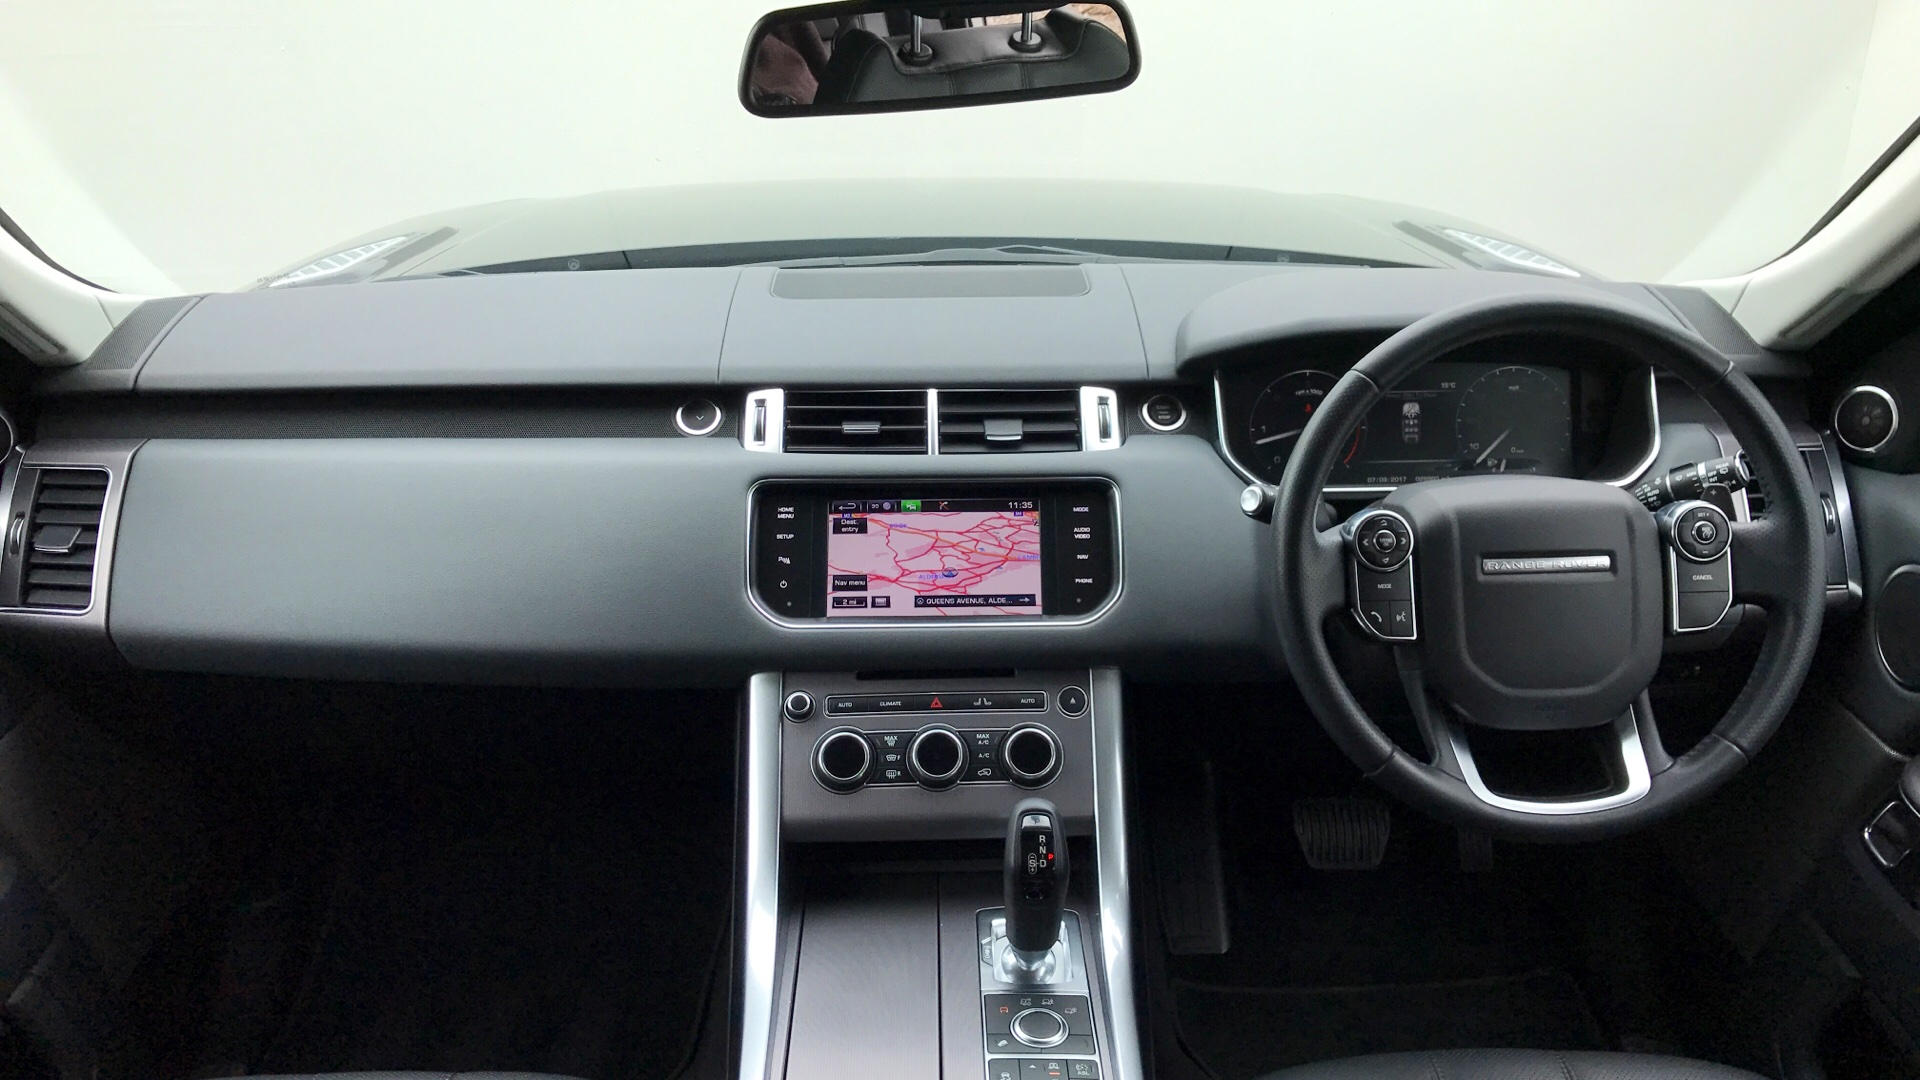 Used Land Rover Range Rover Sport HSE SDV6 Black LG63BTF